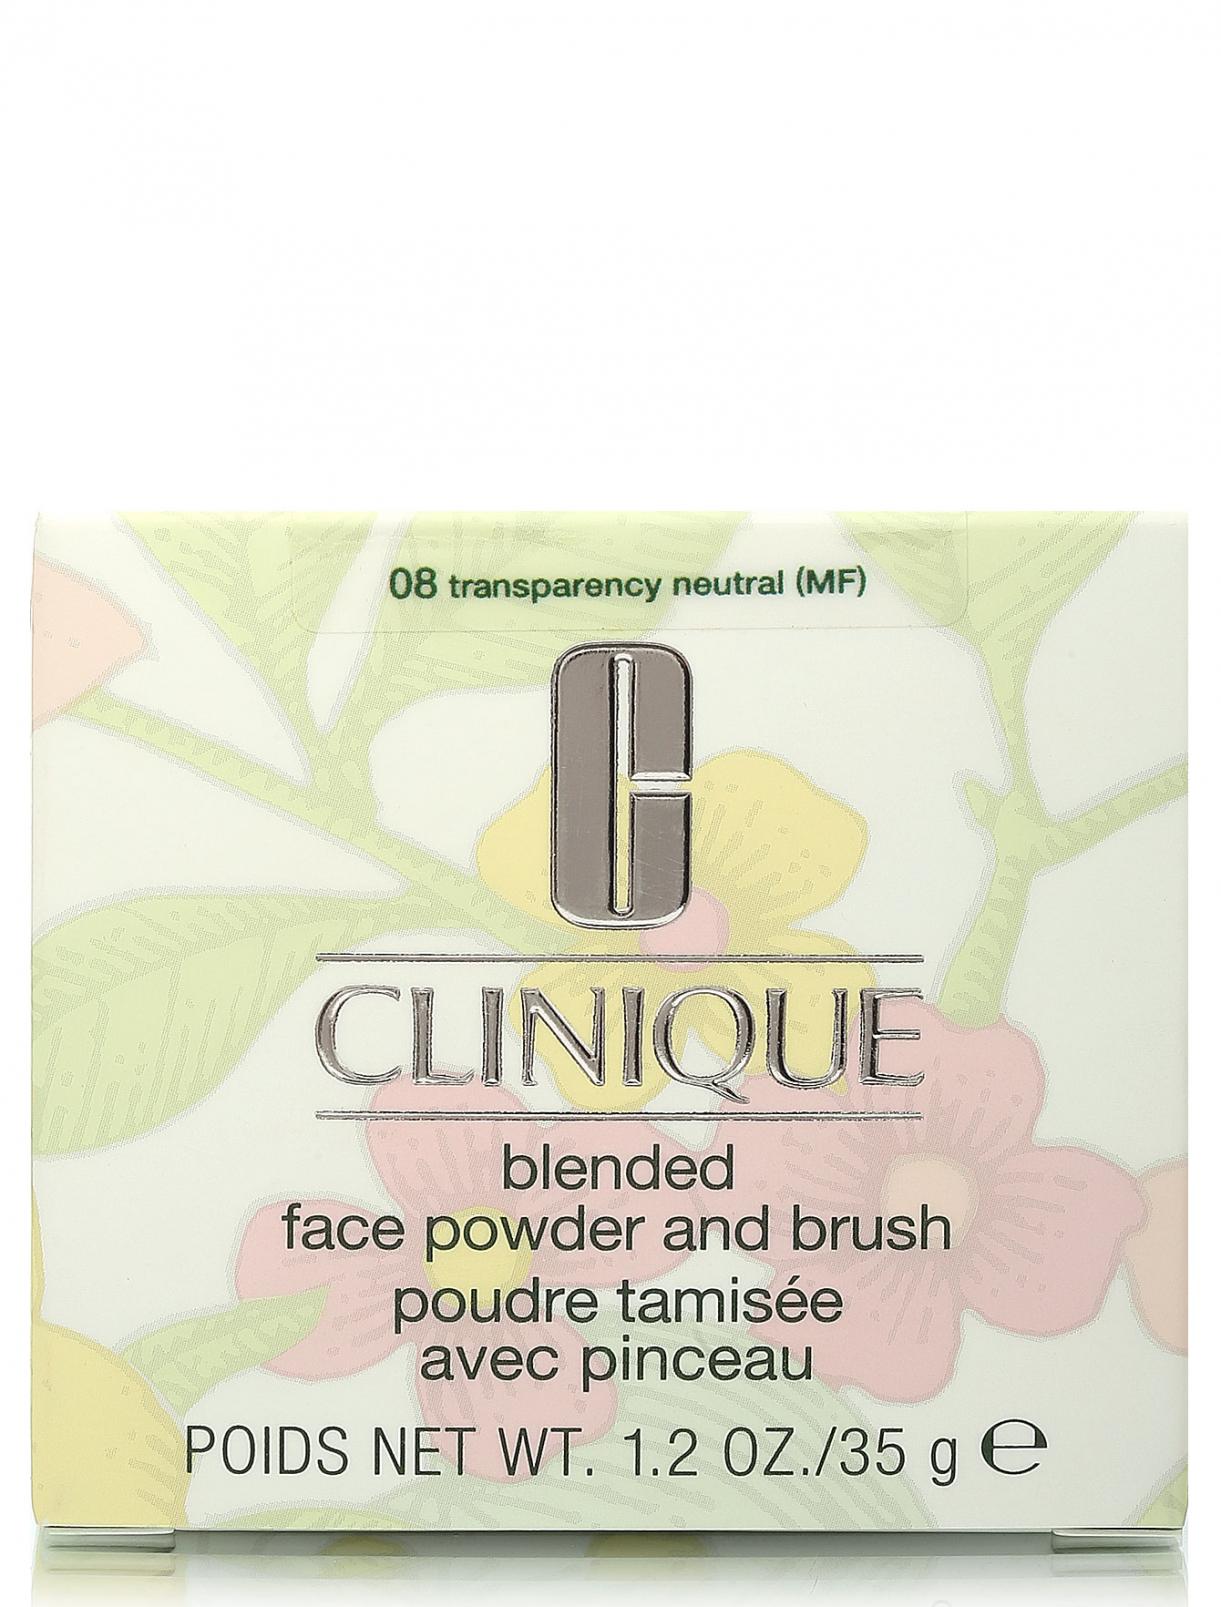 Прозрачная пудра - №8 Transparency neutral, Powders And Compacts Clinique  –  Модель Общий вид